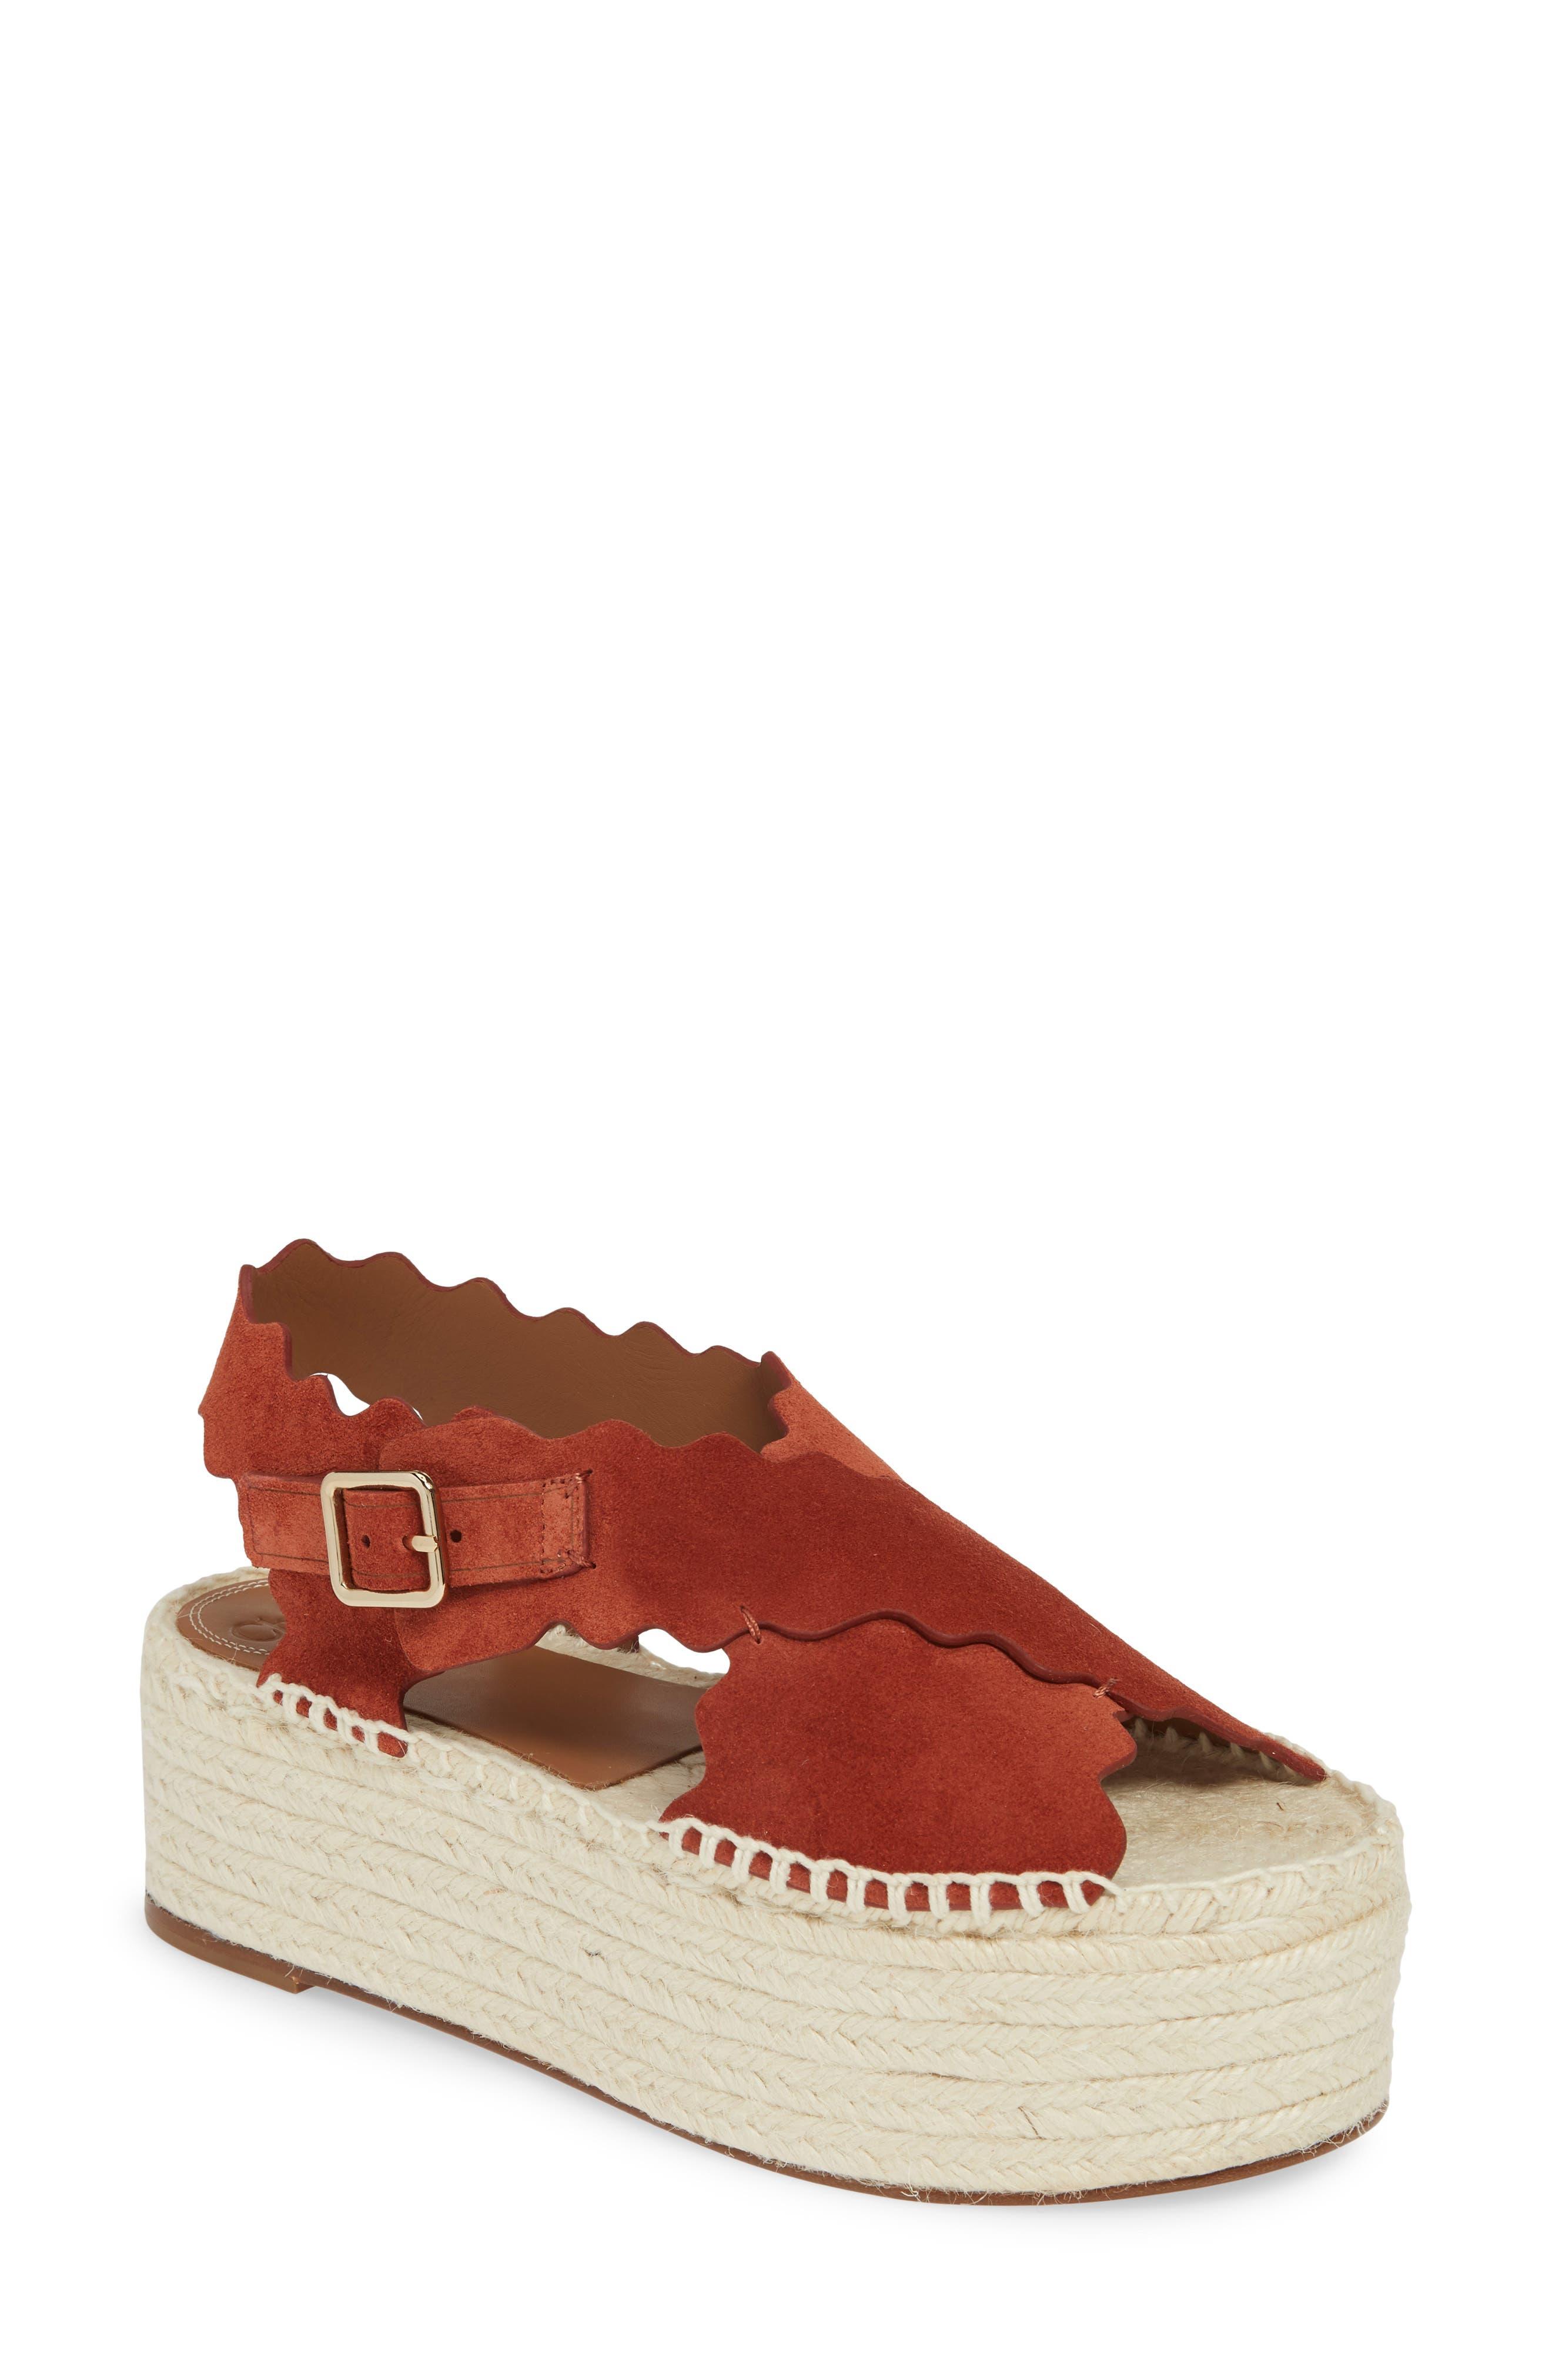 CHLOÉ, Lauren Scalloped Flatform Sandal, Main thumbnail 1, color, EARTHY RED